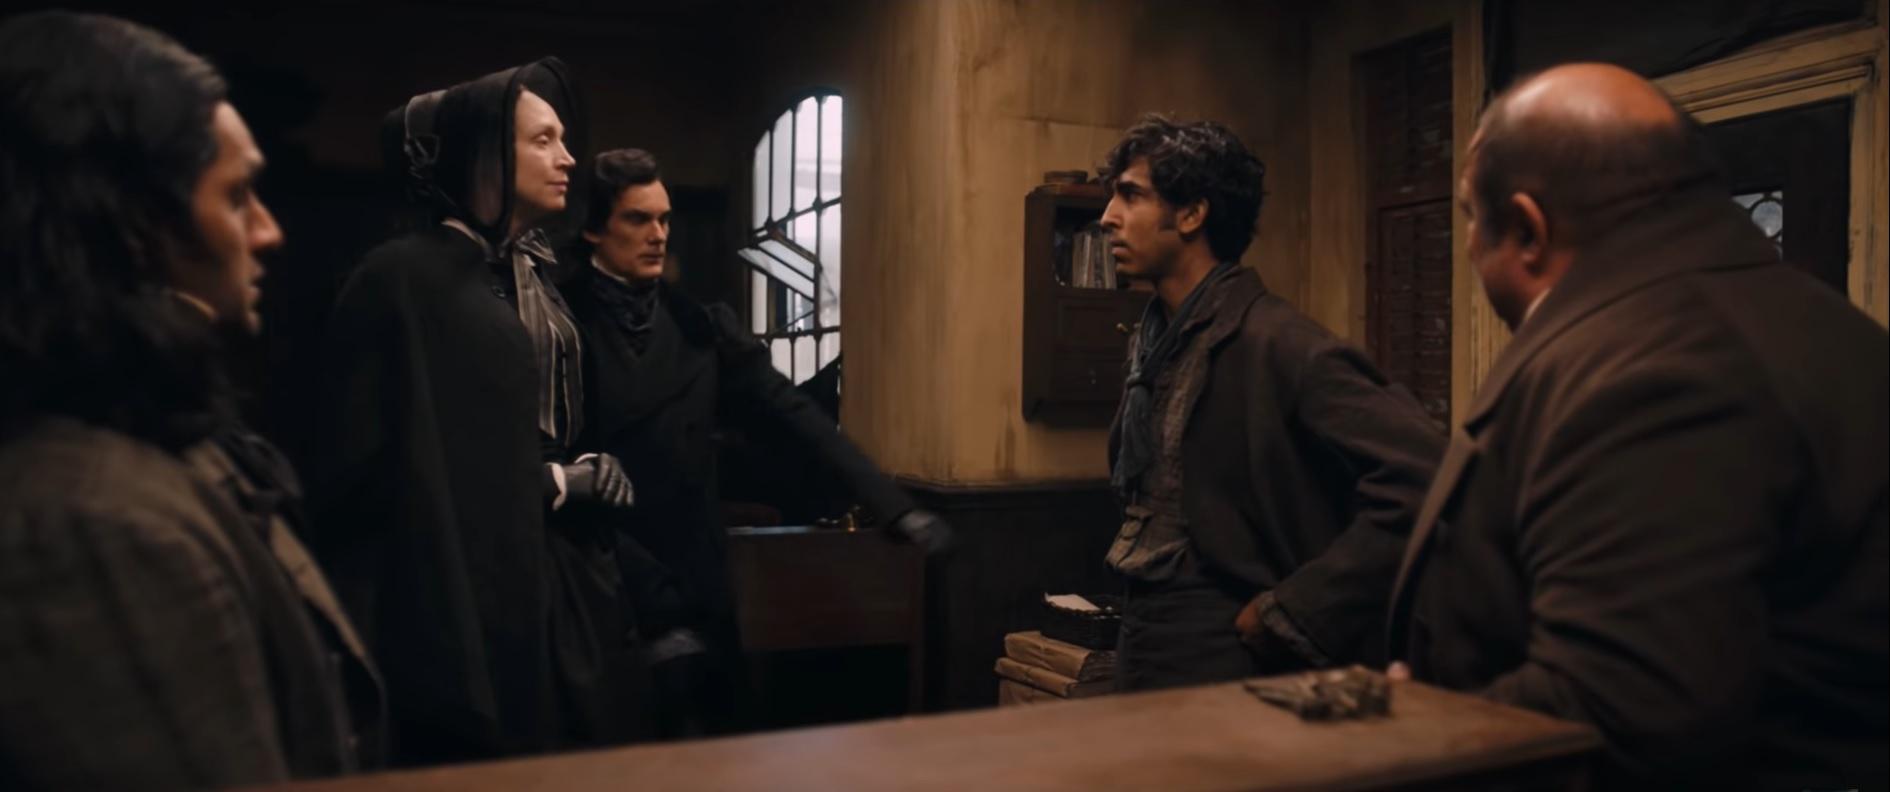 The Personal History of David Copperfield - zwiastun filmu. Za sterami twórca Figurantki